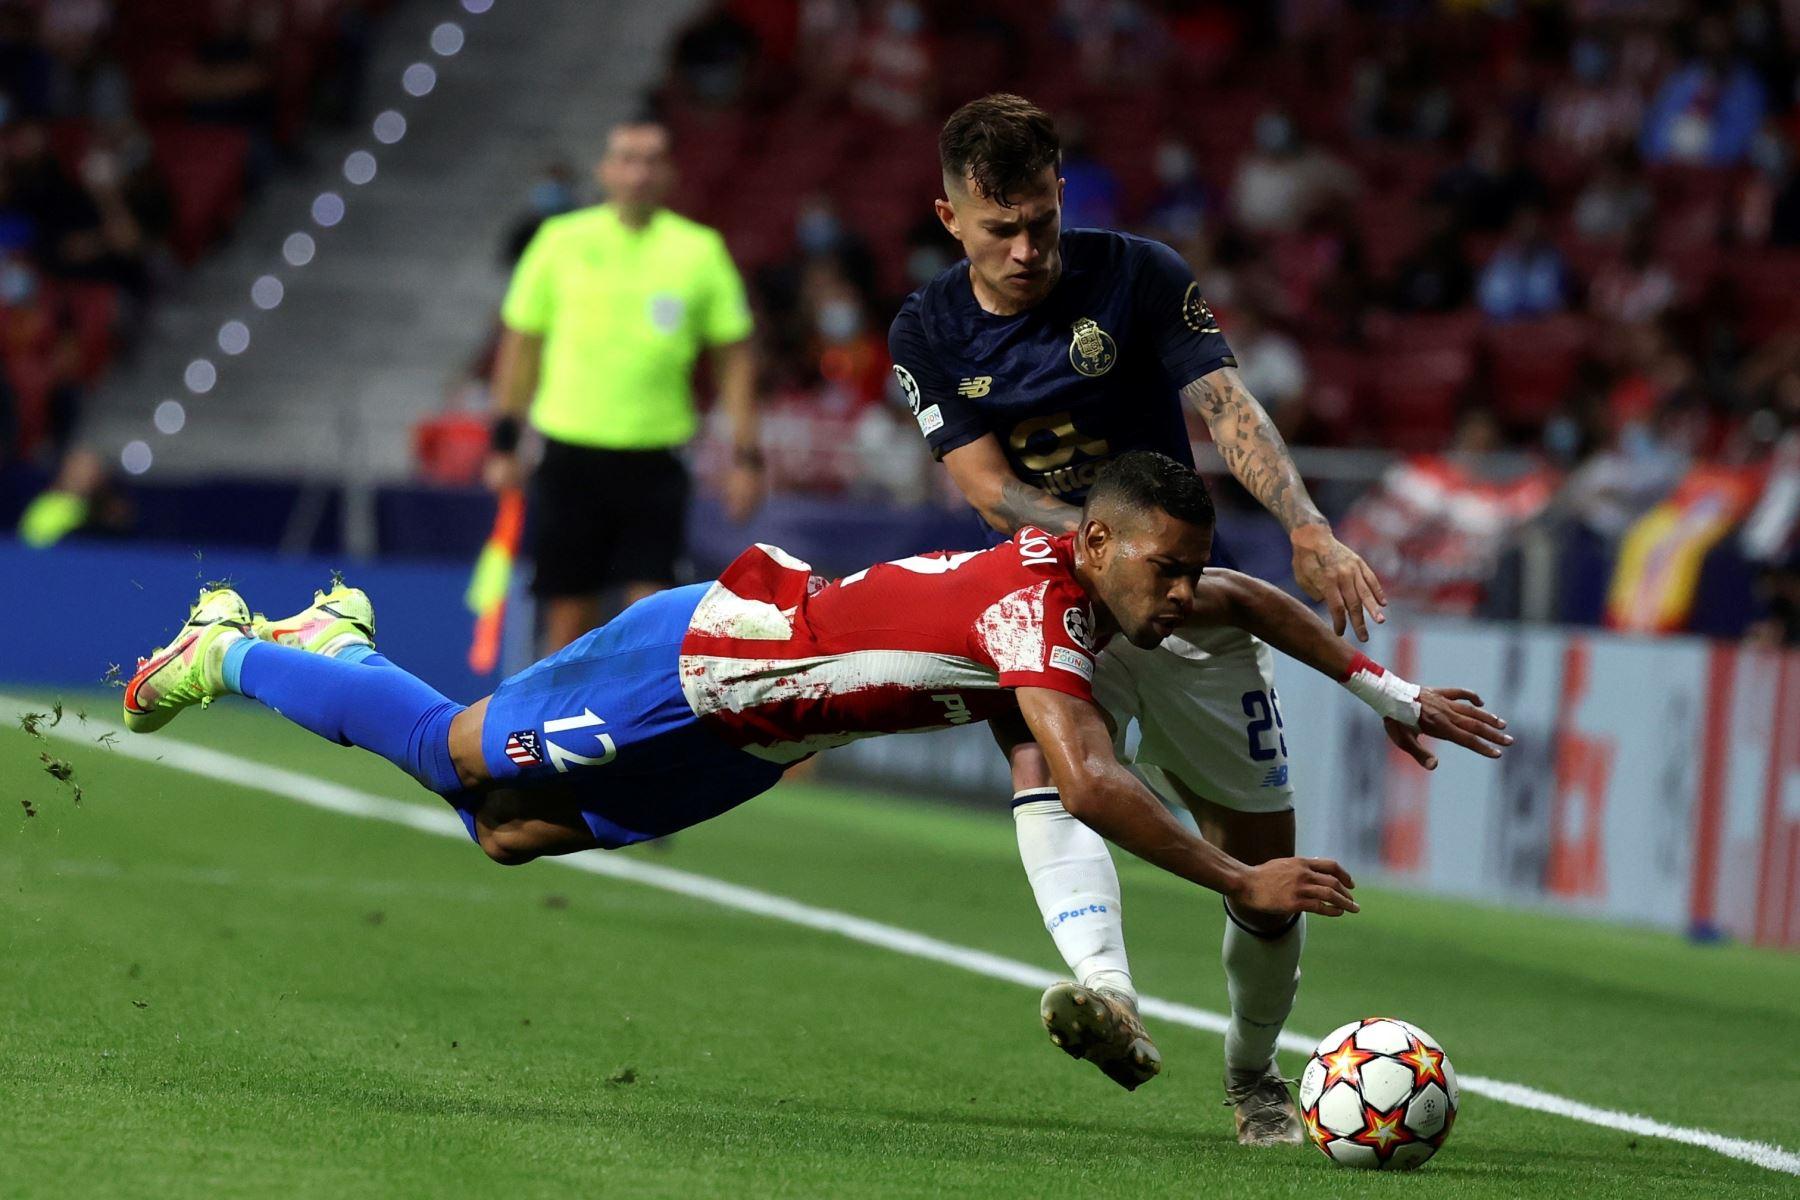 El defensa brasileño del Atlético de Madrid Renan Augusto Lodi lucha con el brasileño Otávio Edmilson da Silva, del Oporto. EFE/Kiko Huesca